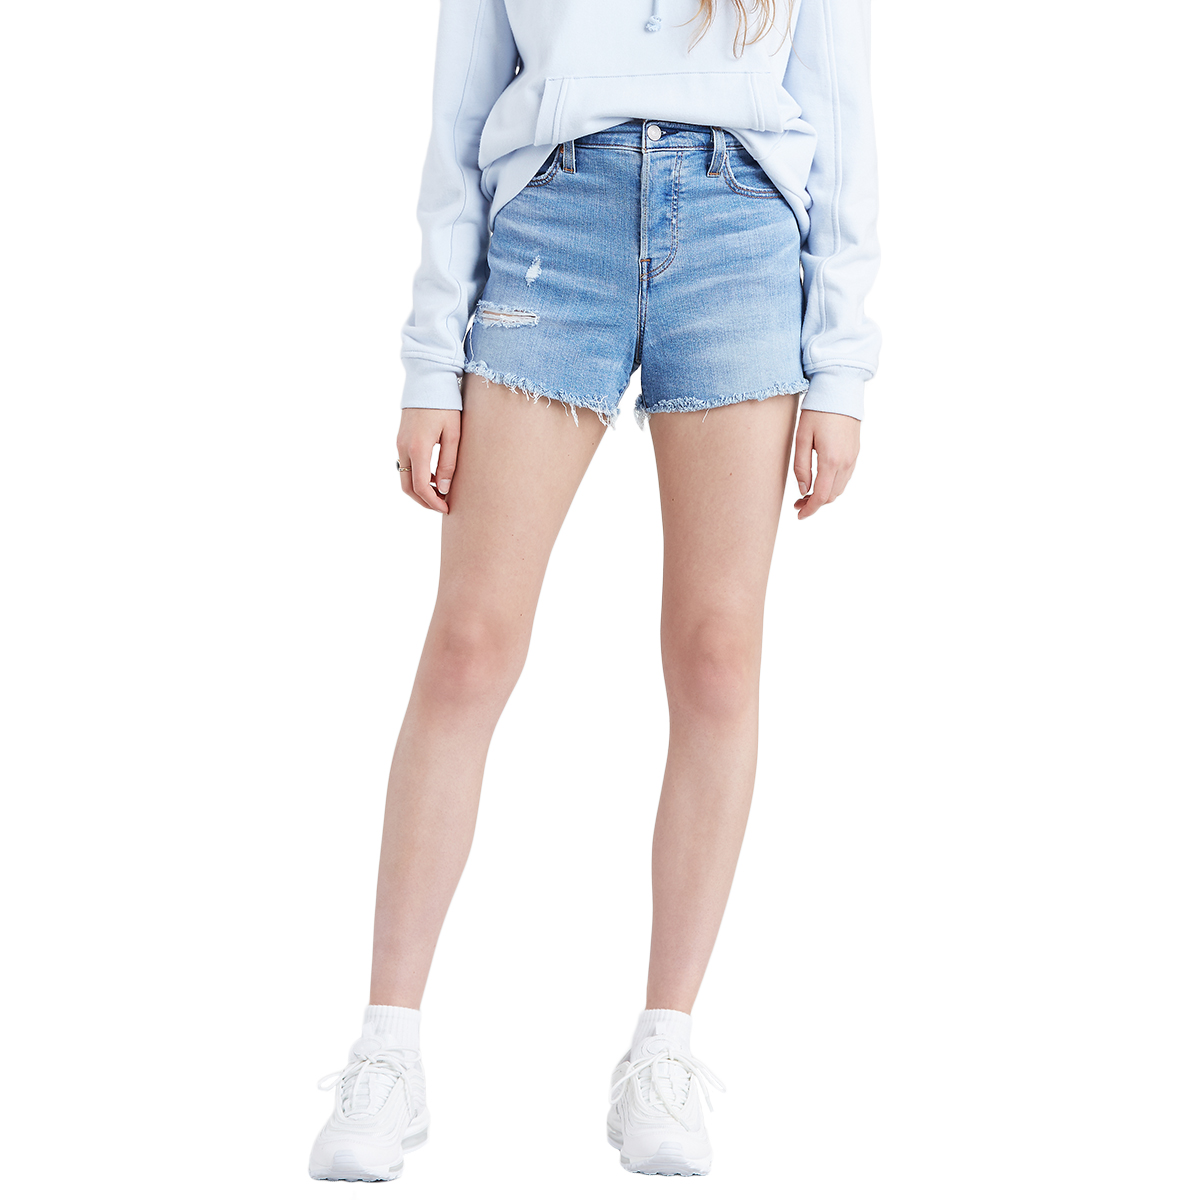 Levi's Women's High Waisted Jean Shorts - Blue, 29